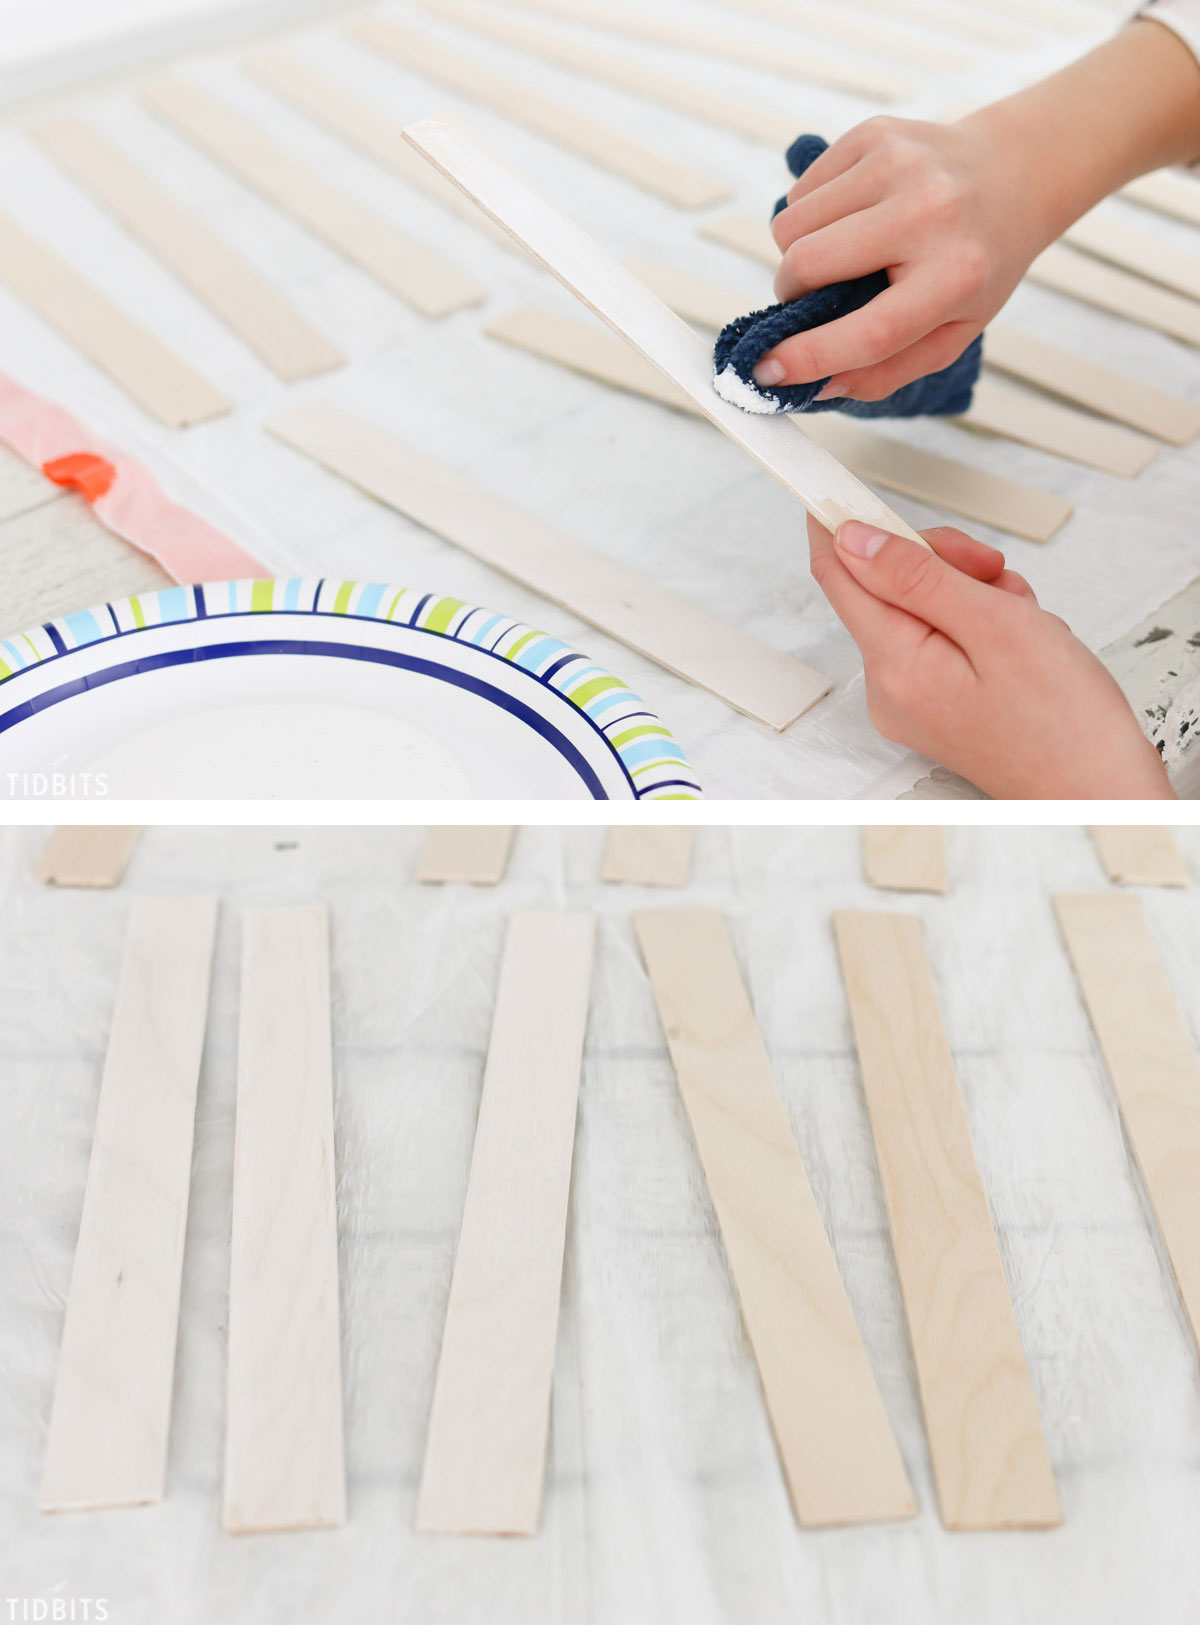 Easy DIY reversible mini chalkboard and whiteboard, by TIDBITS